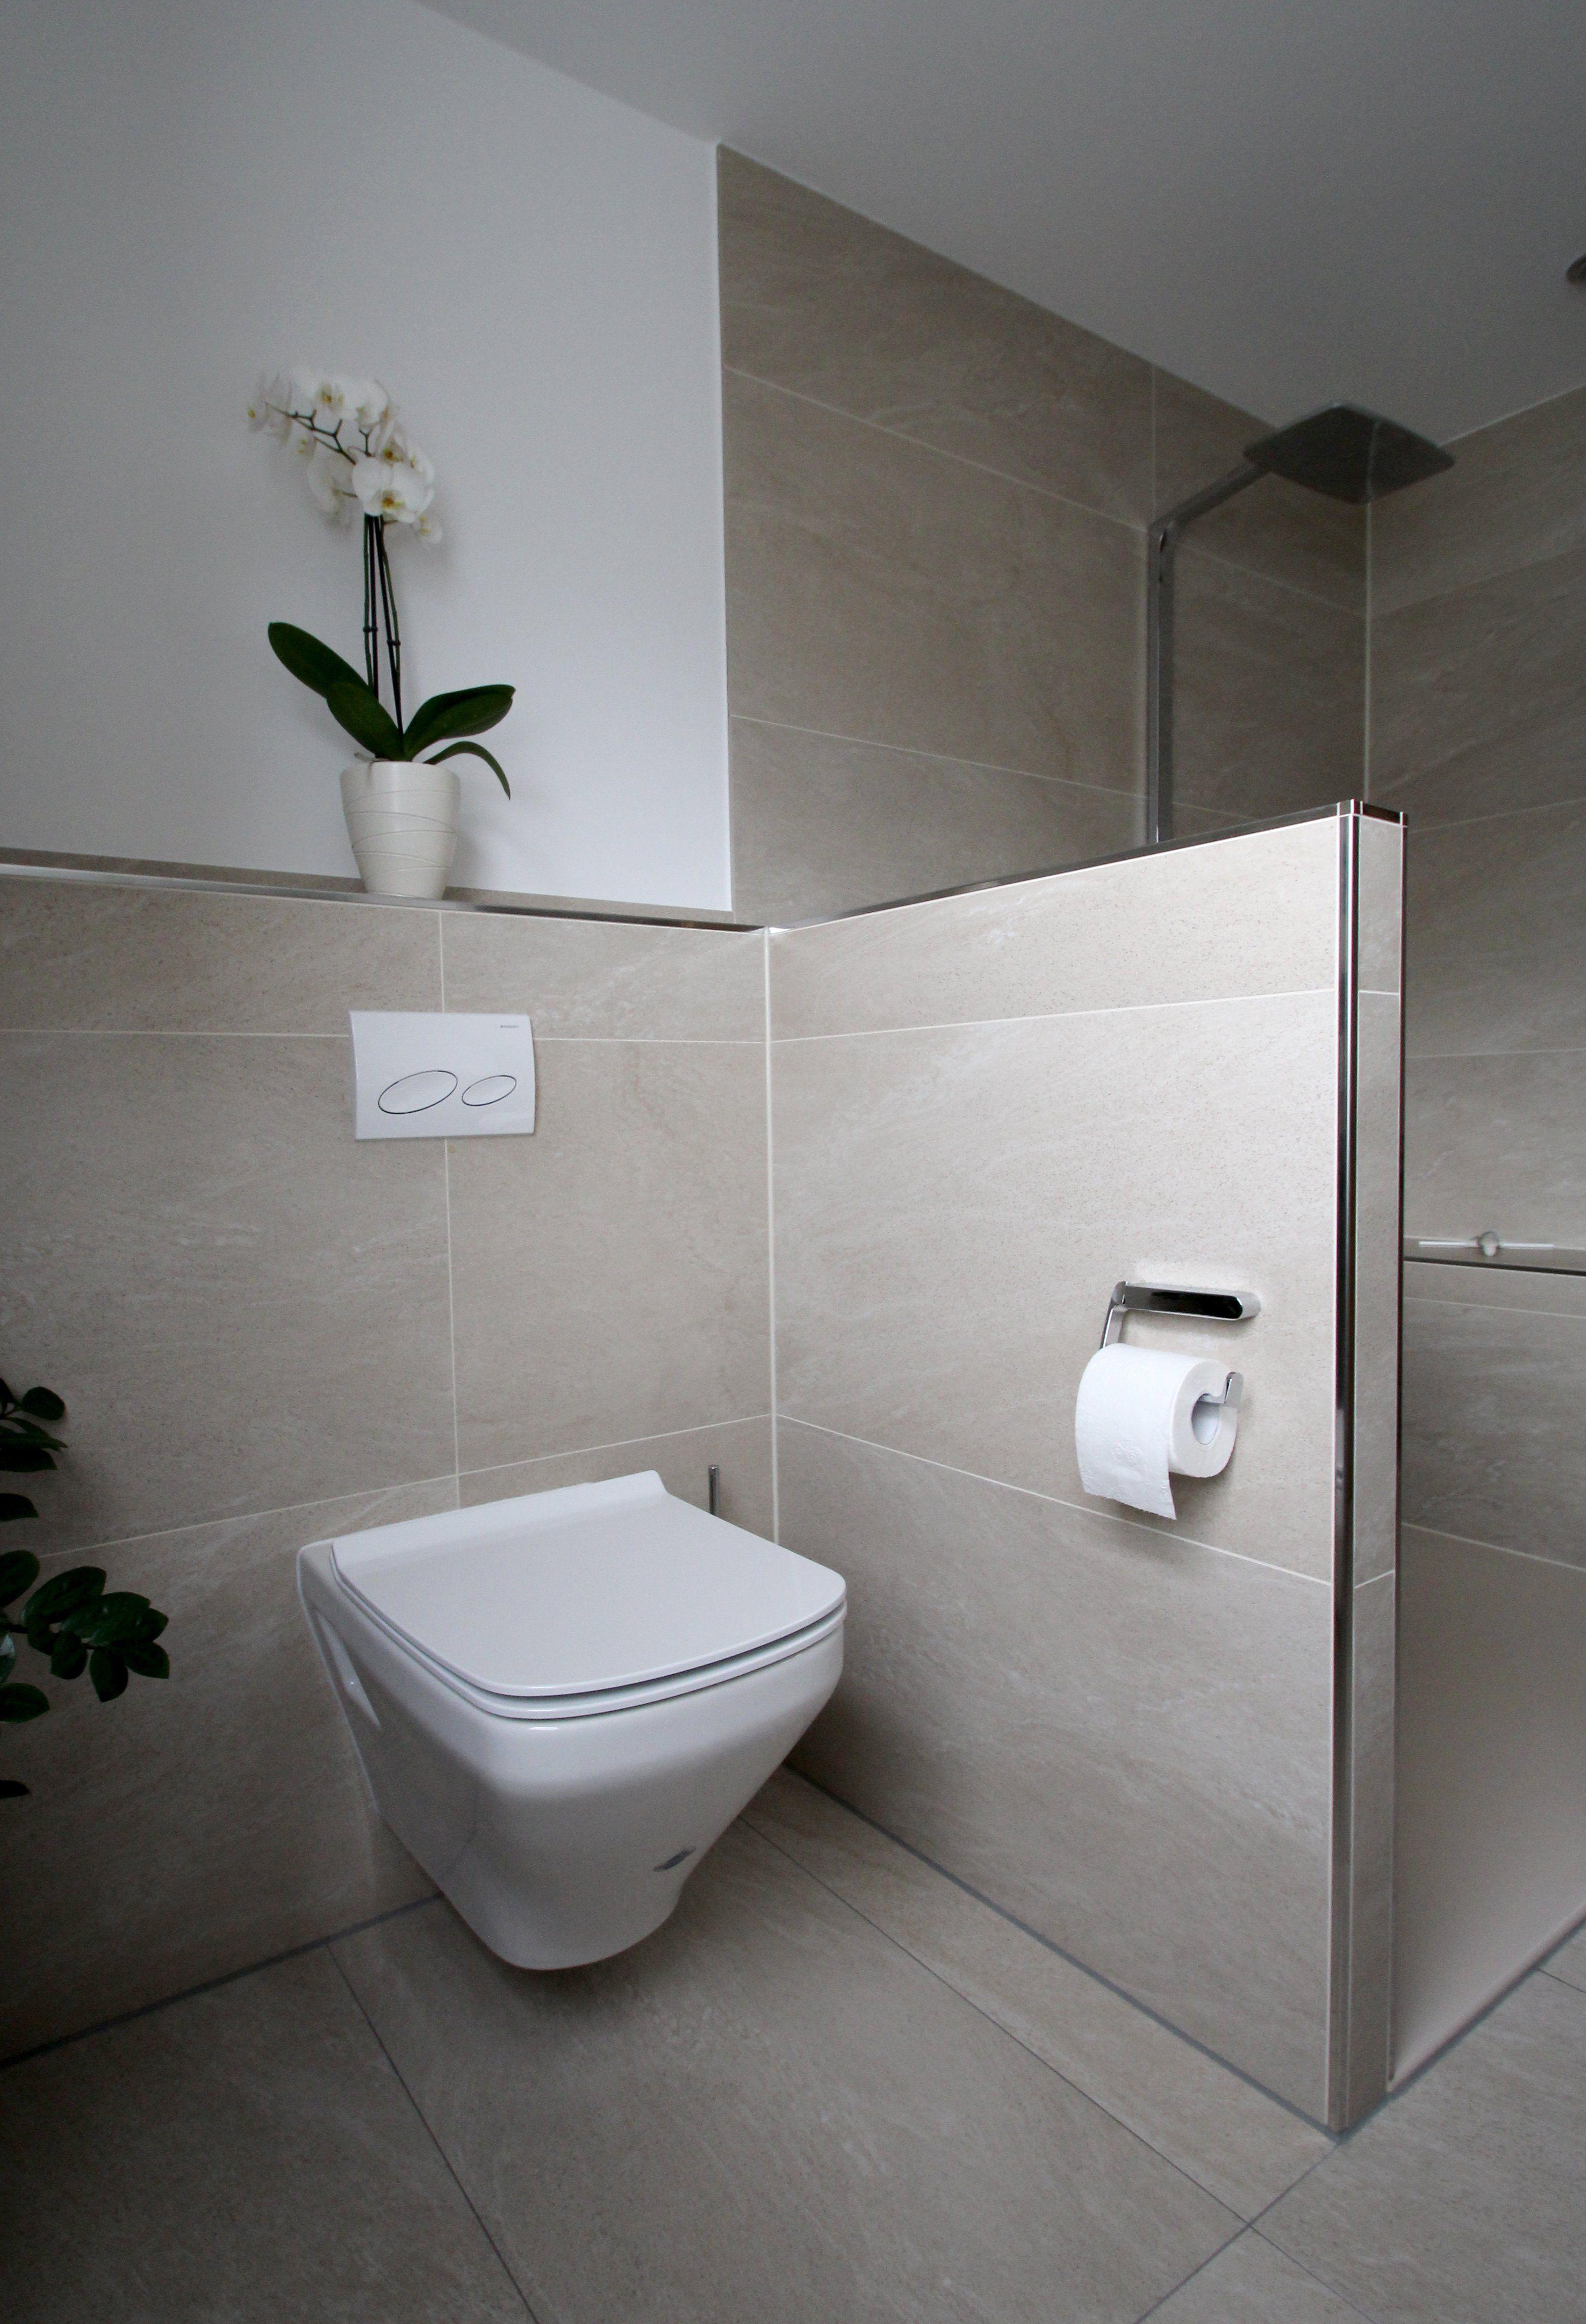 Badezimmer Badezimmer Kleine Badezimmer Bad Einrichten